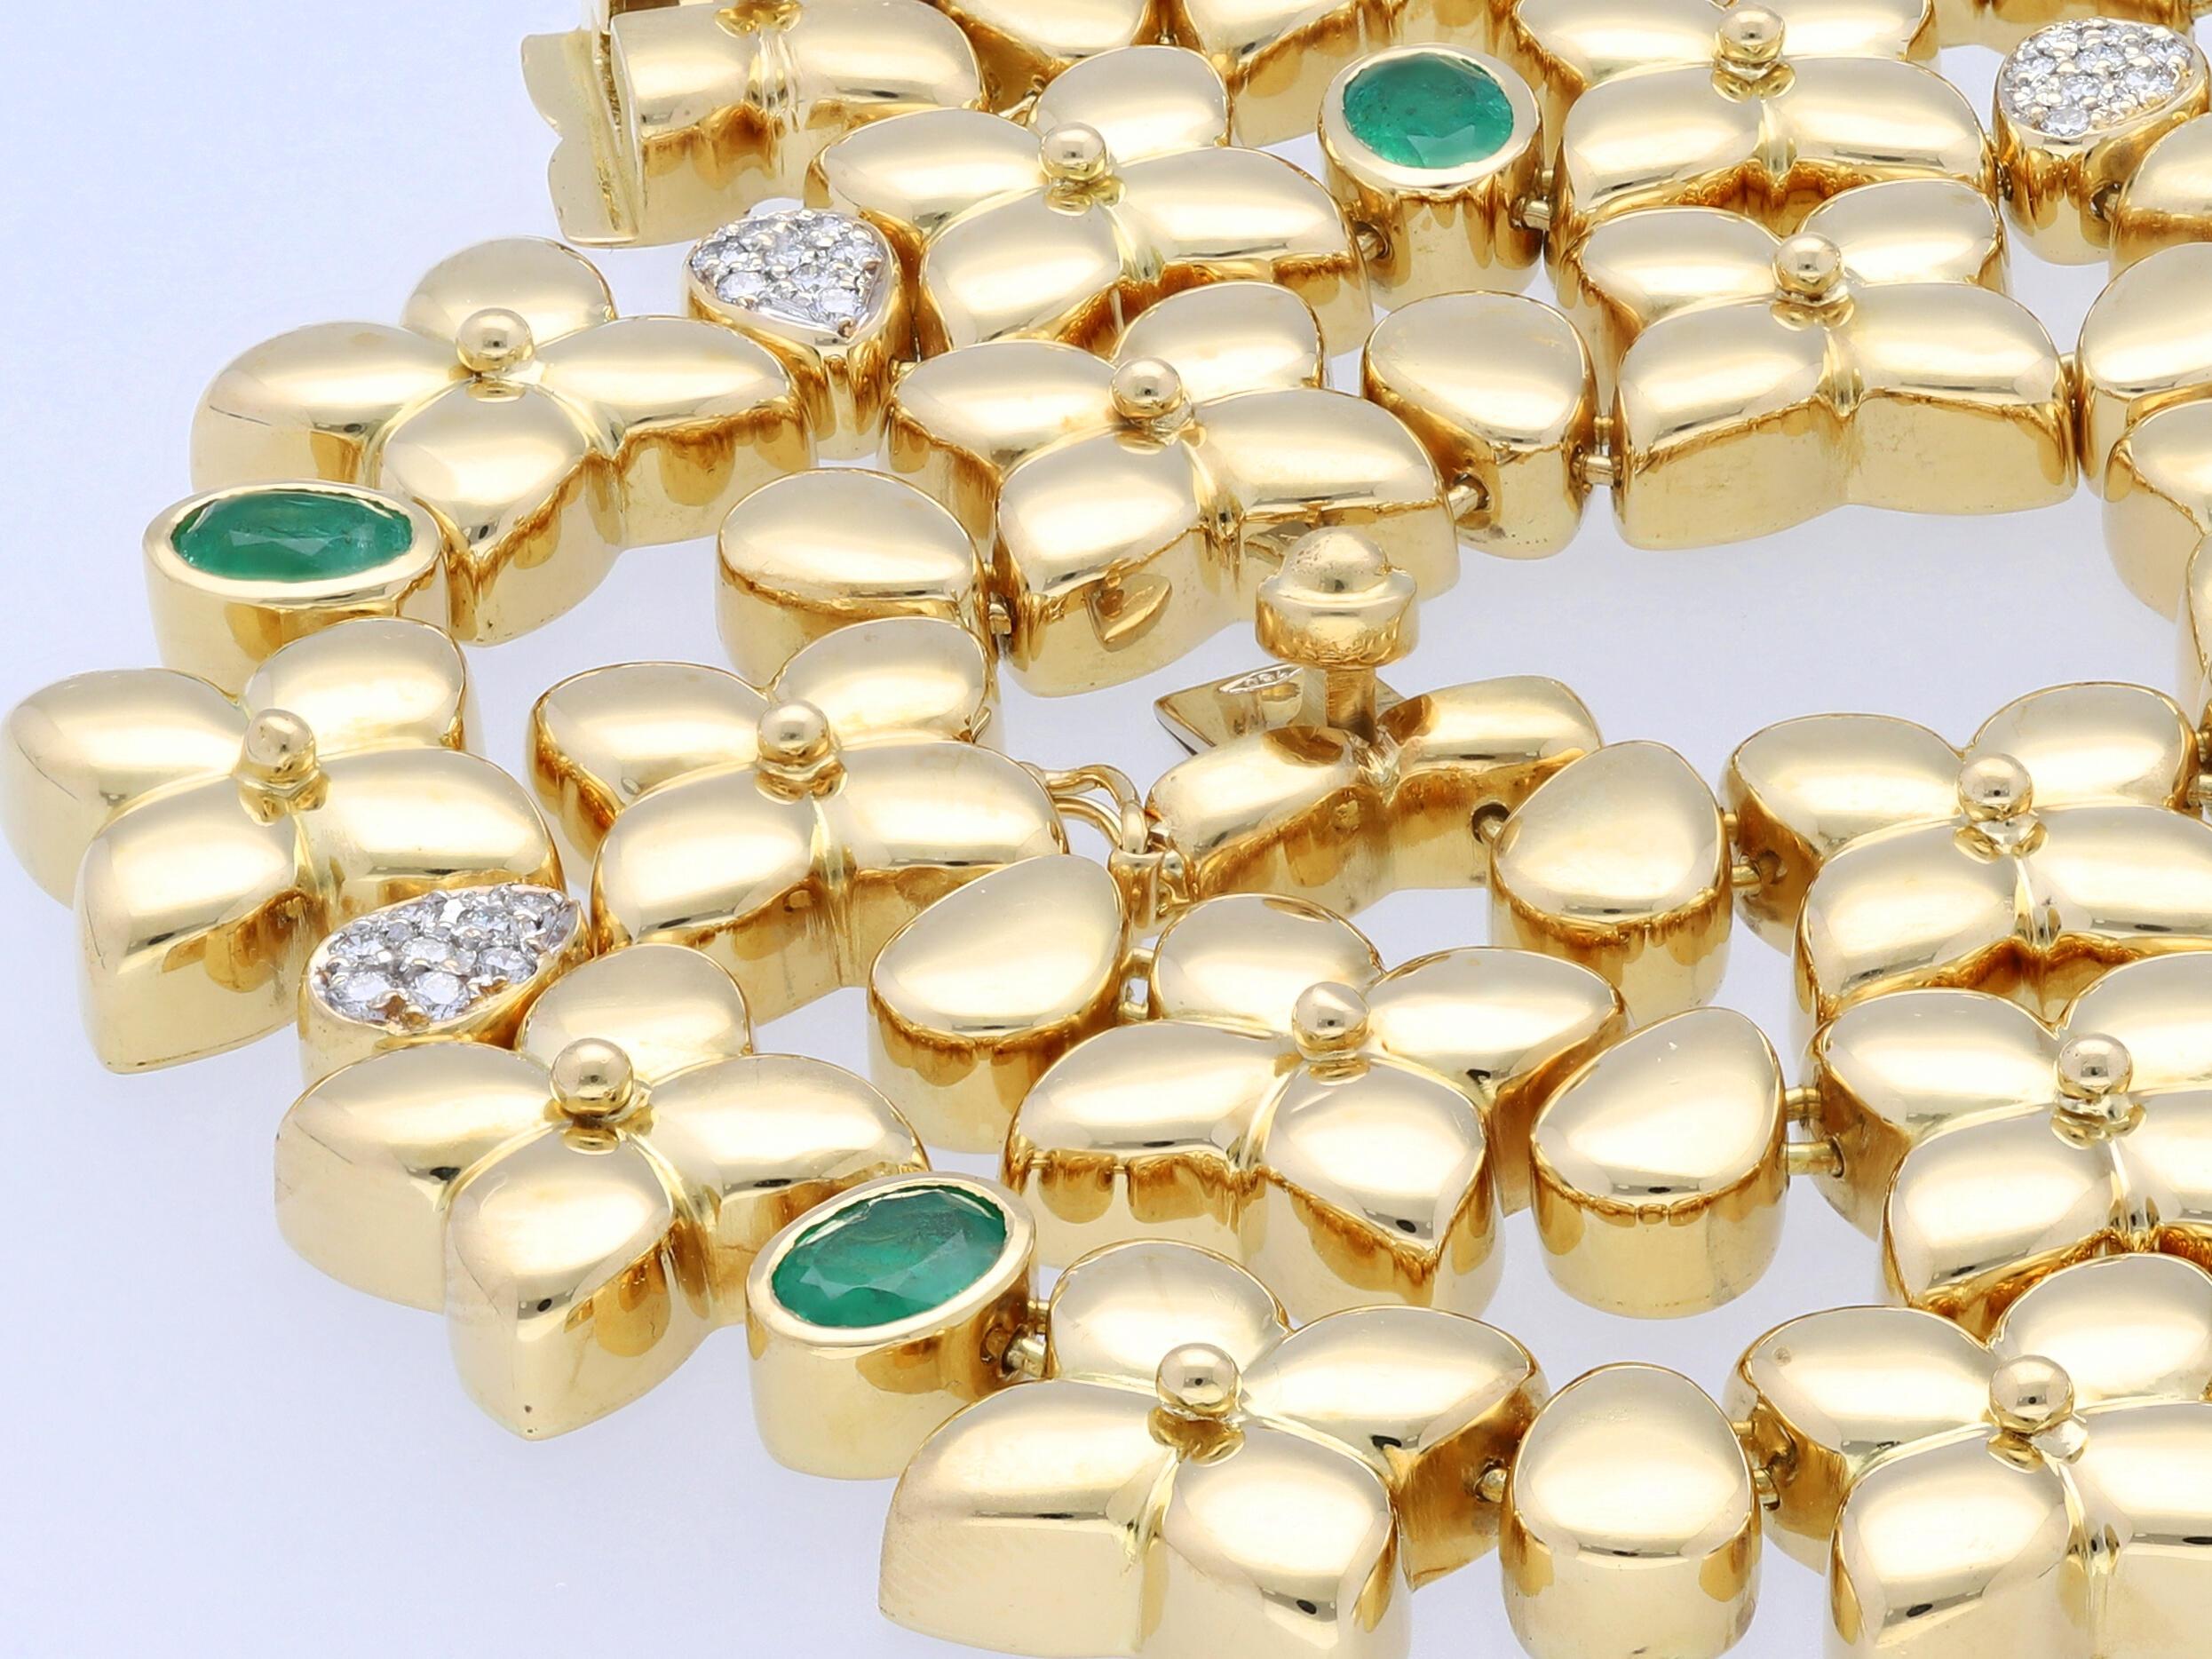 kette collier 4 24 karat brillanten smaragde 750 gold wert ca eur ebay. Black Bedroom Furniture Sets. Home Design Ideas